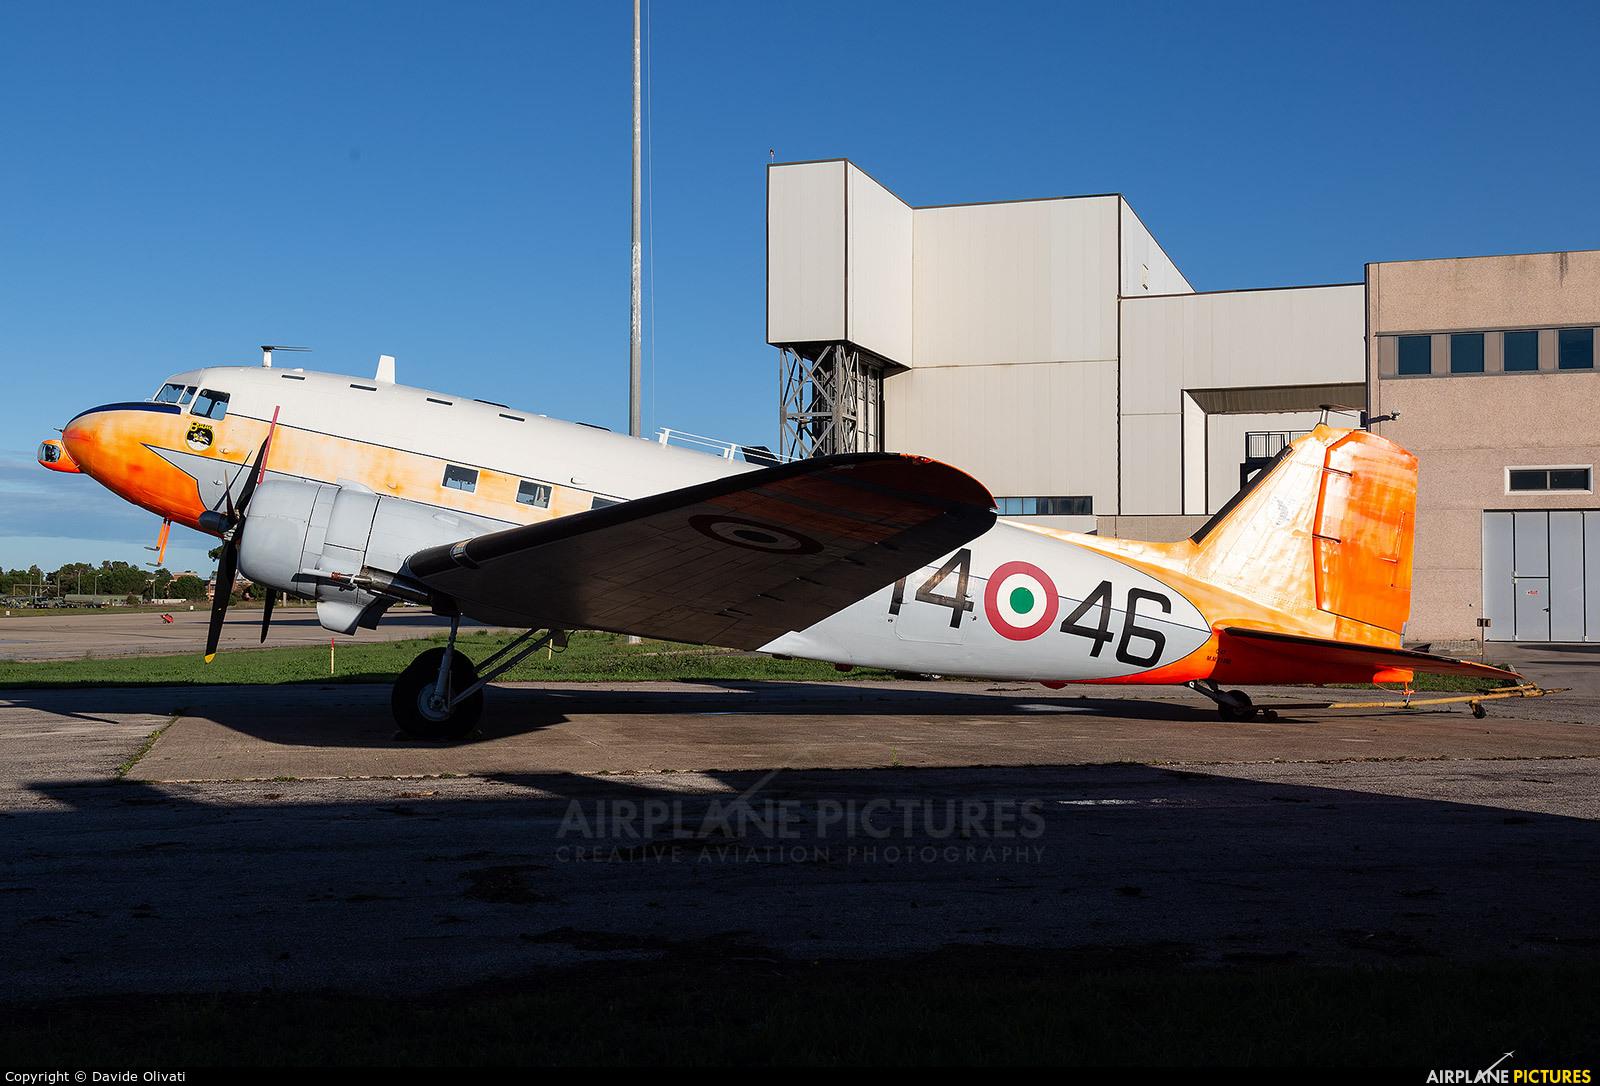 Italy - Air Force MM61893 aircraft at Pratica di Mare